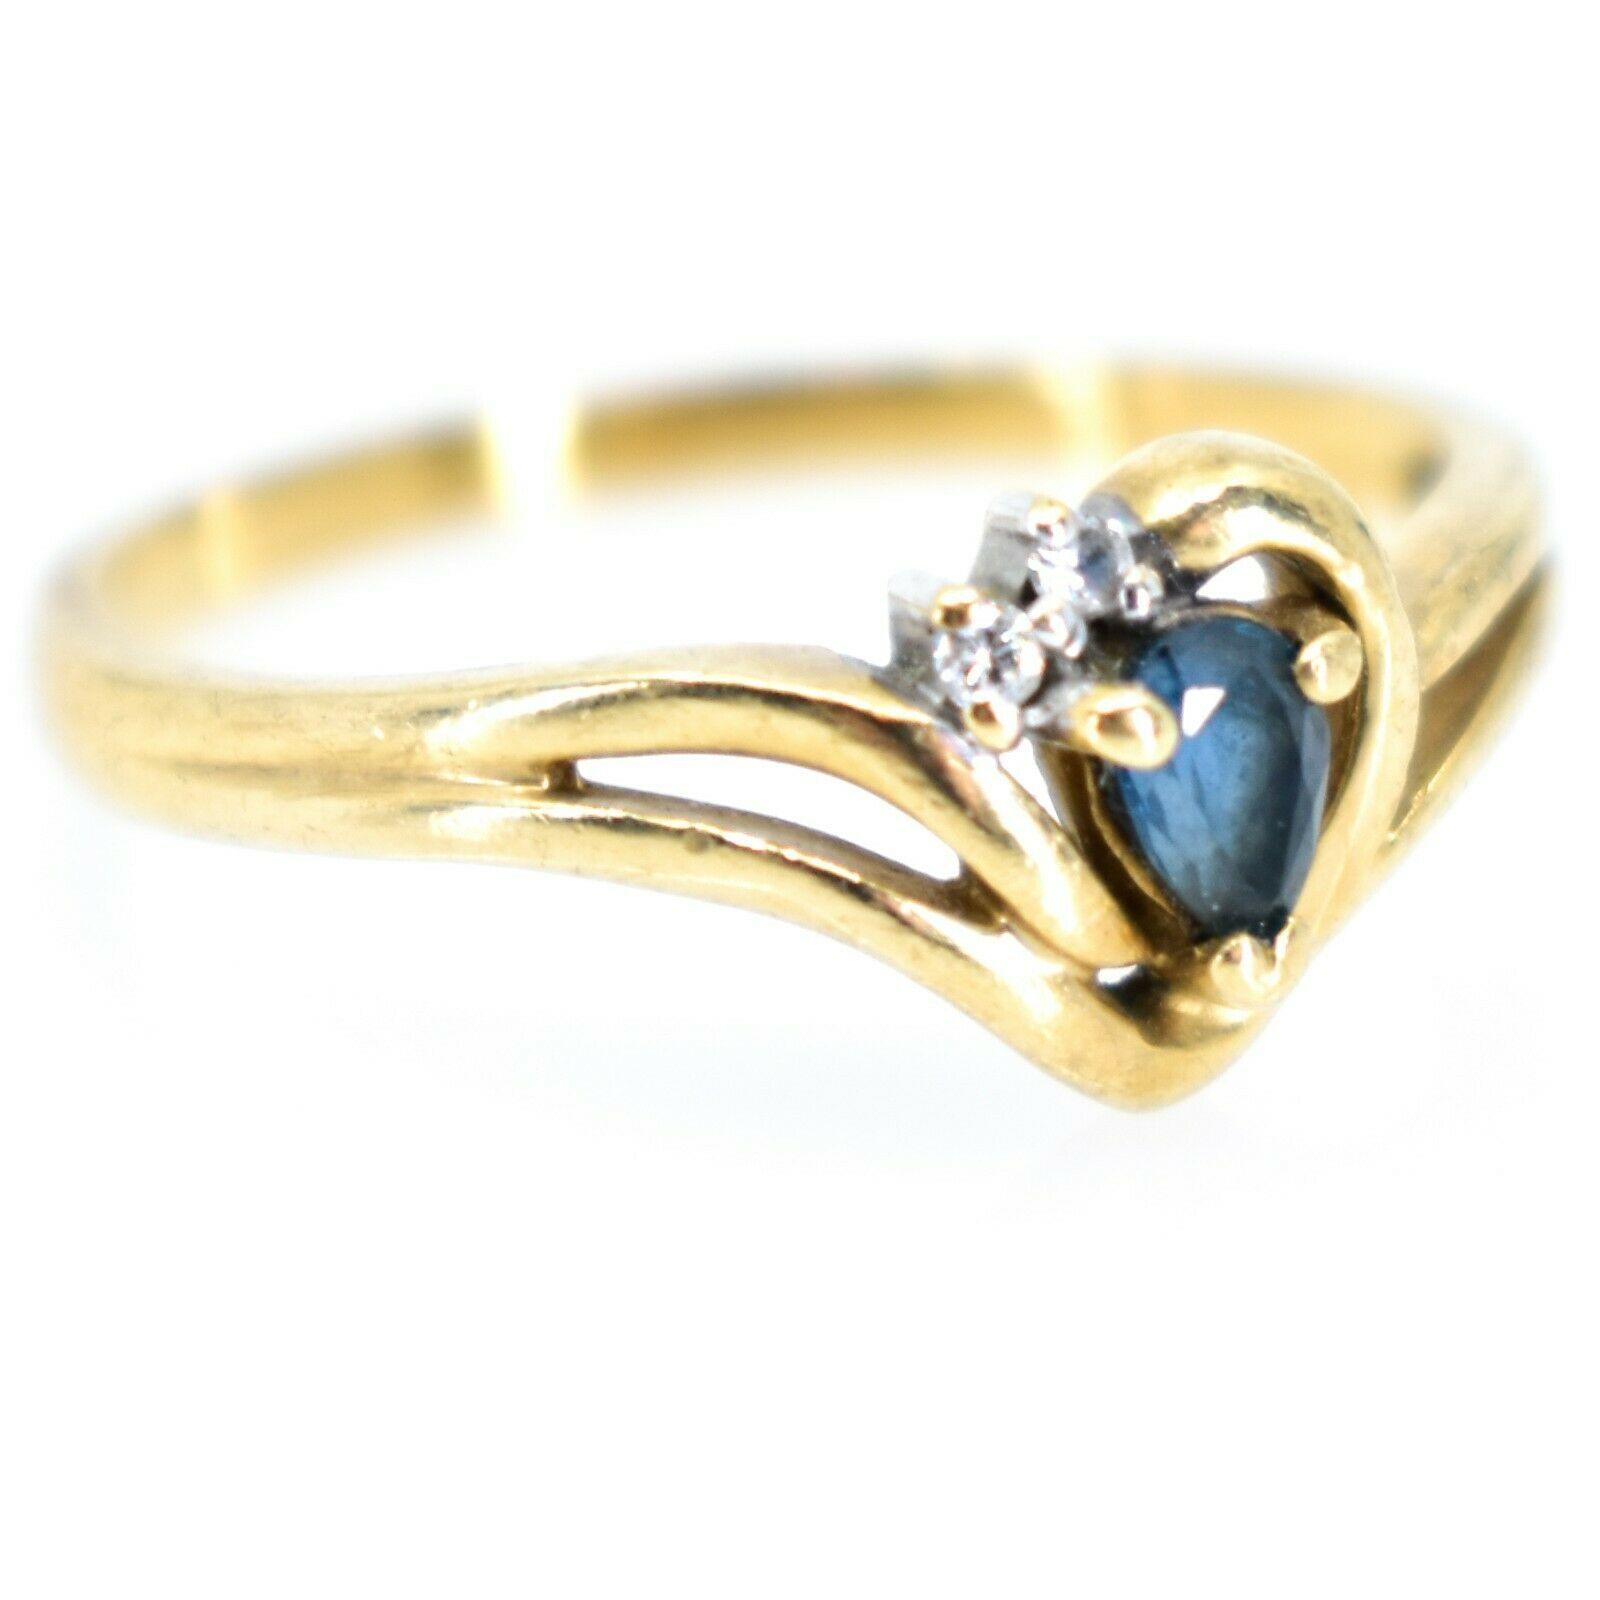 10K Yellow Gold Diamond & Pear Cut Sapphire Gemstone Ring Size 6.25 2.1g